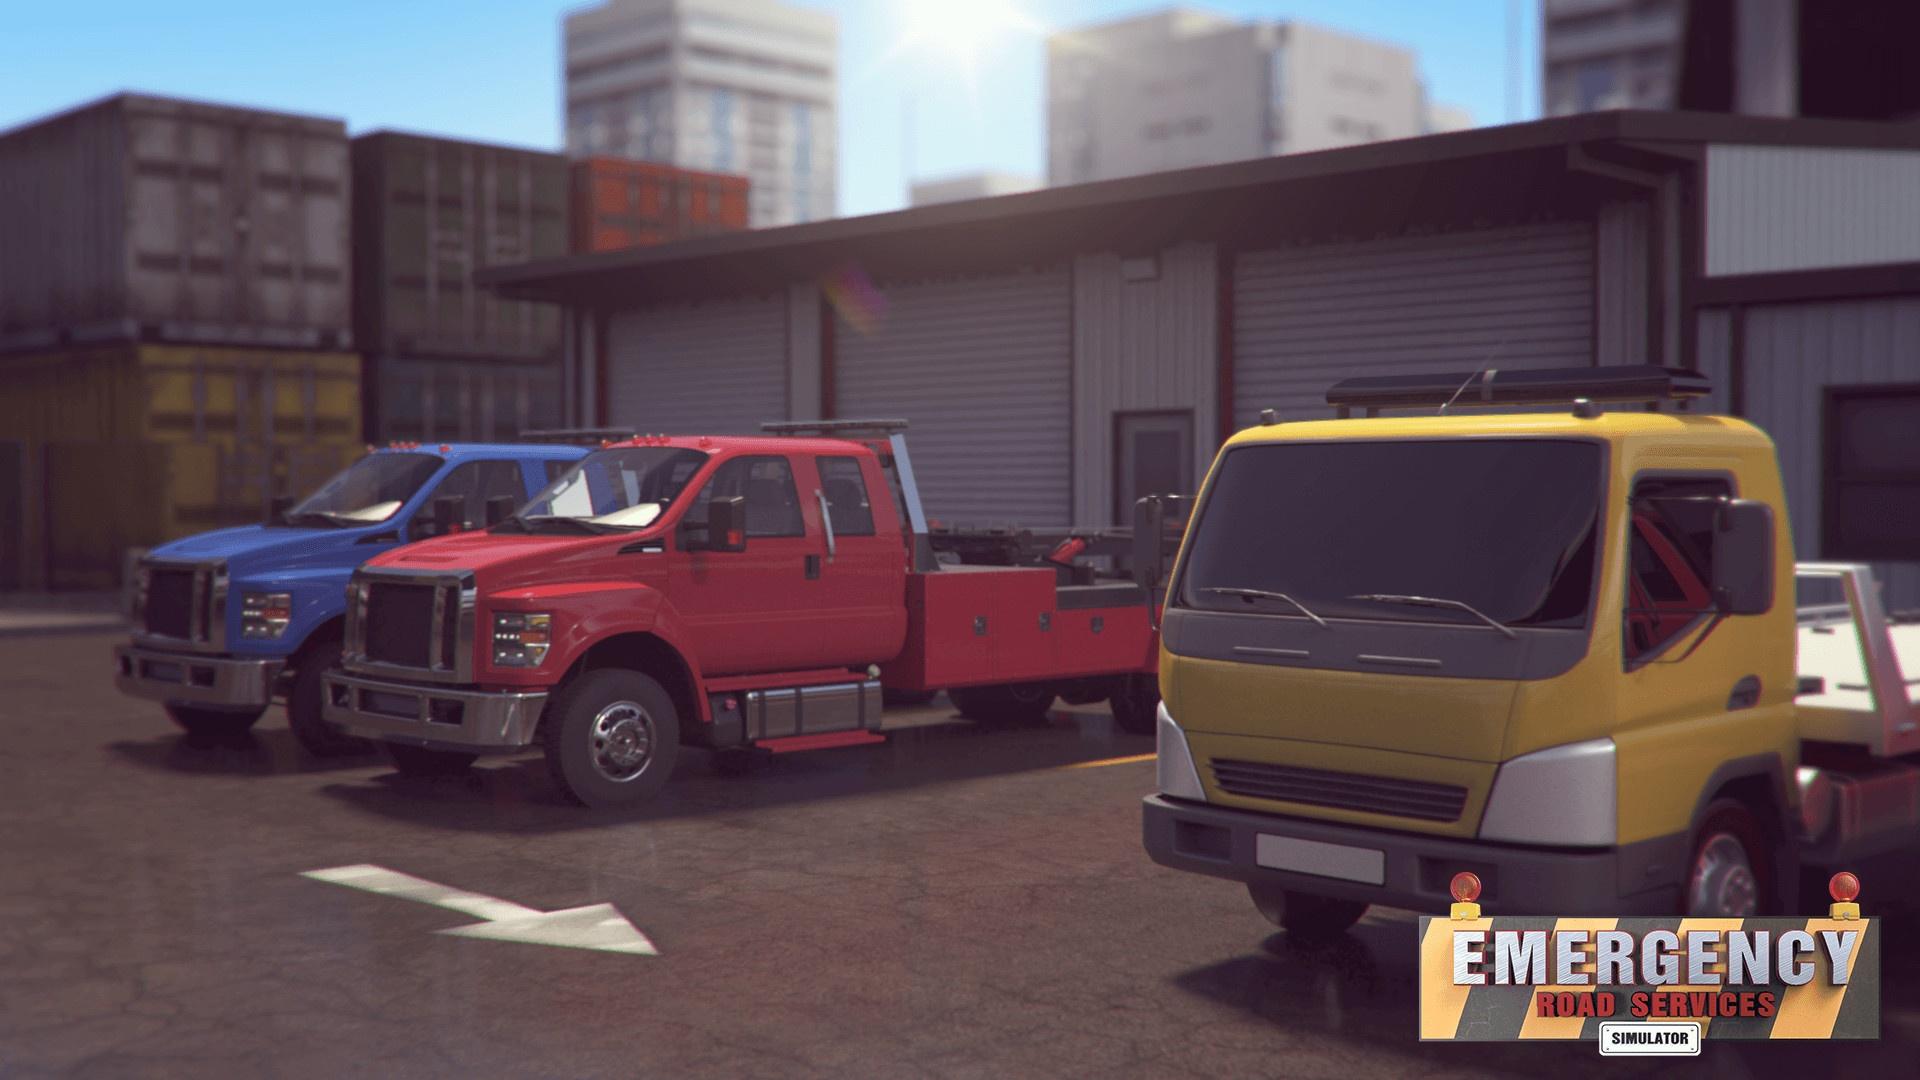 Emergency Road Services Simulator | T-Bull